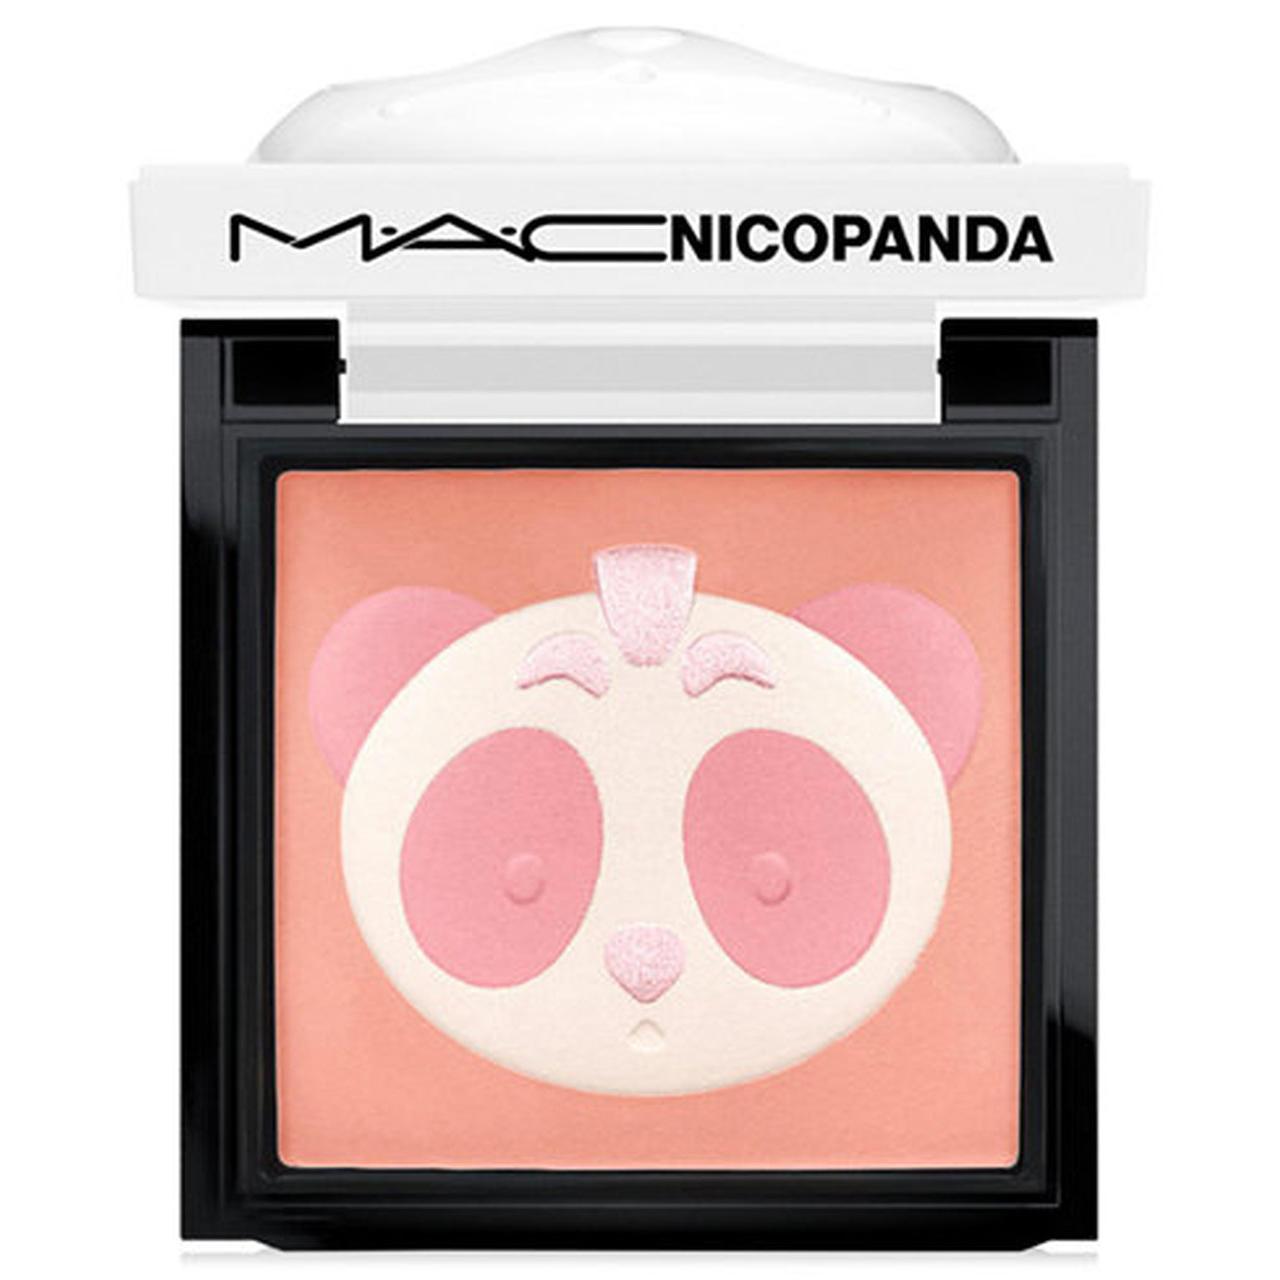 MAC x Nicopanda Gleamer Face Palette Colour Me Nico